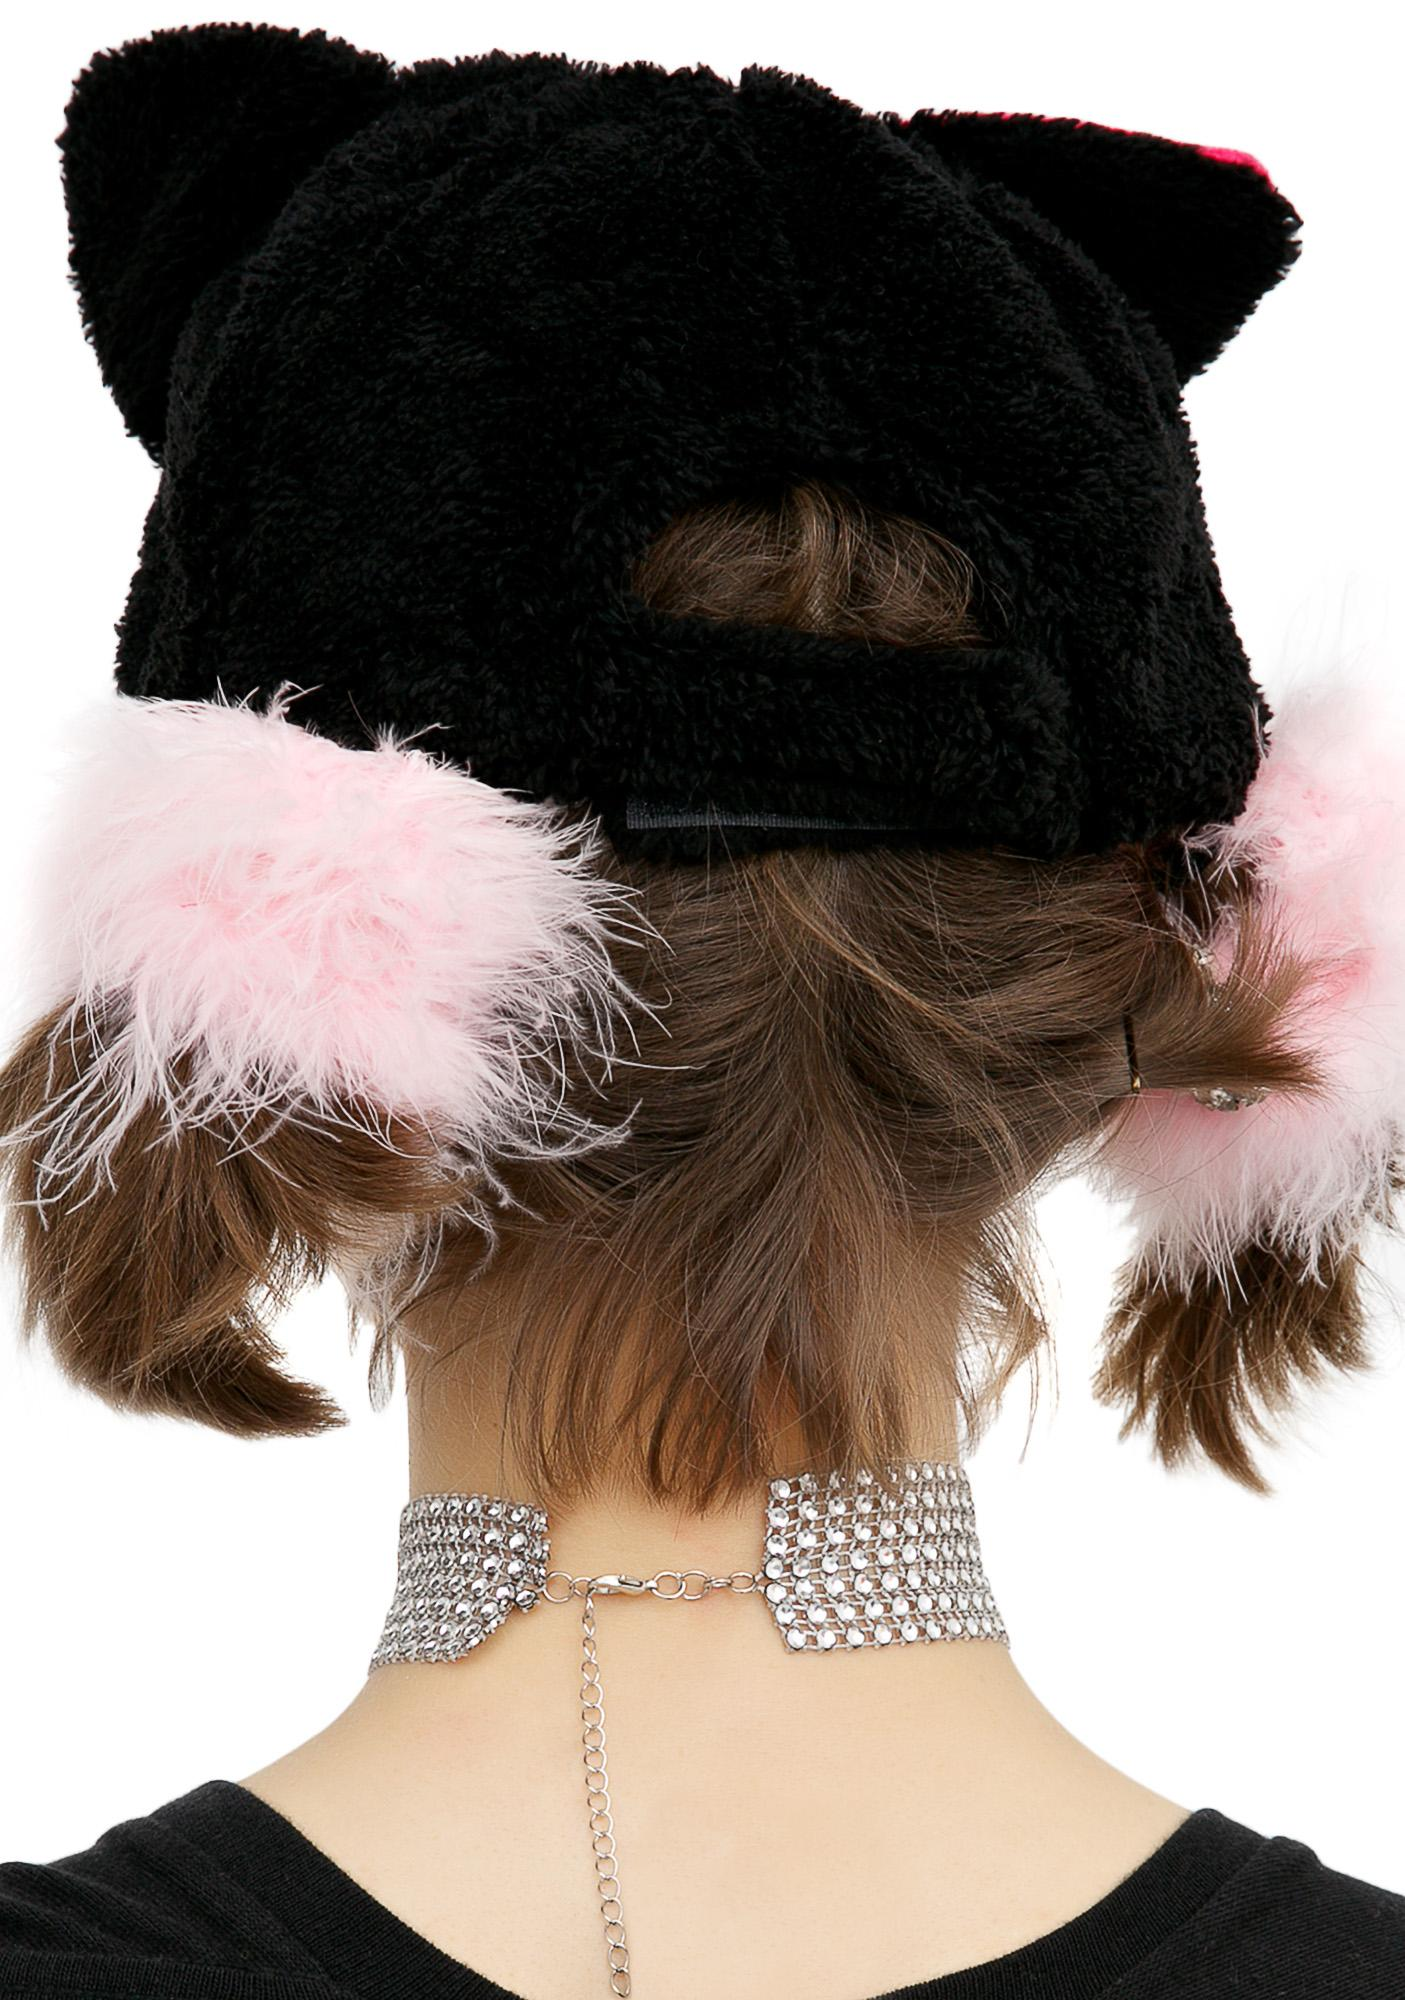 e95085ffe43 Black Cat Fuzzy Baseball Hat